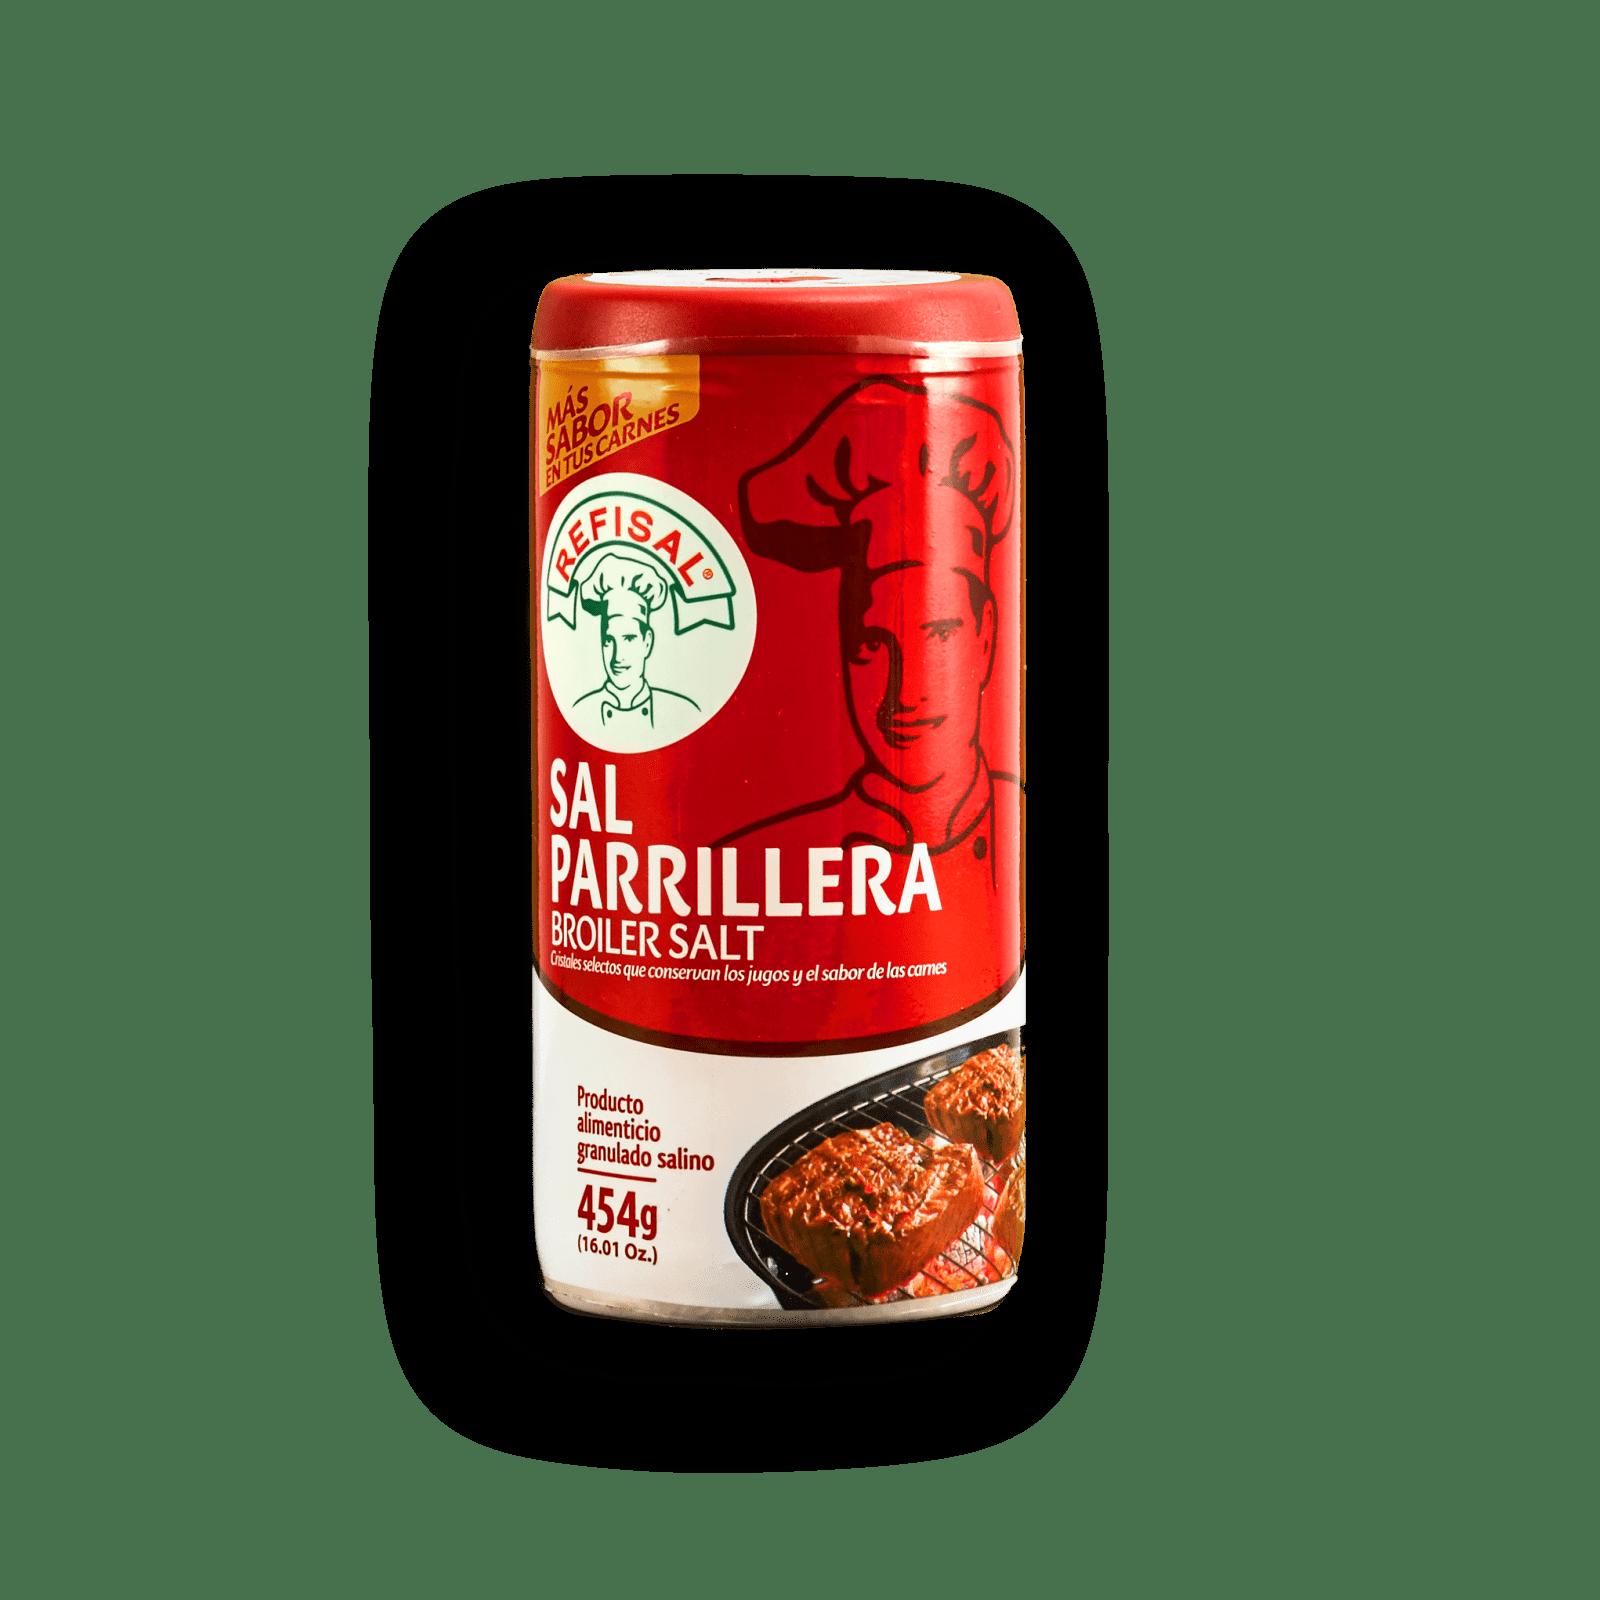 Sal Parrillera Refisal